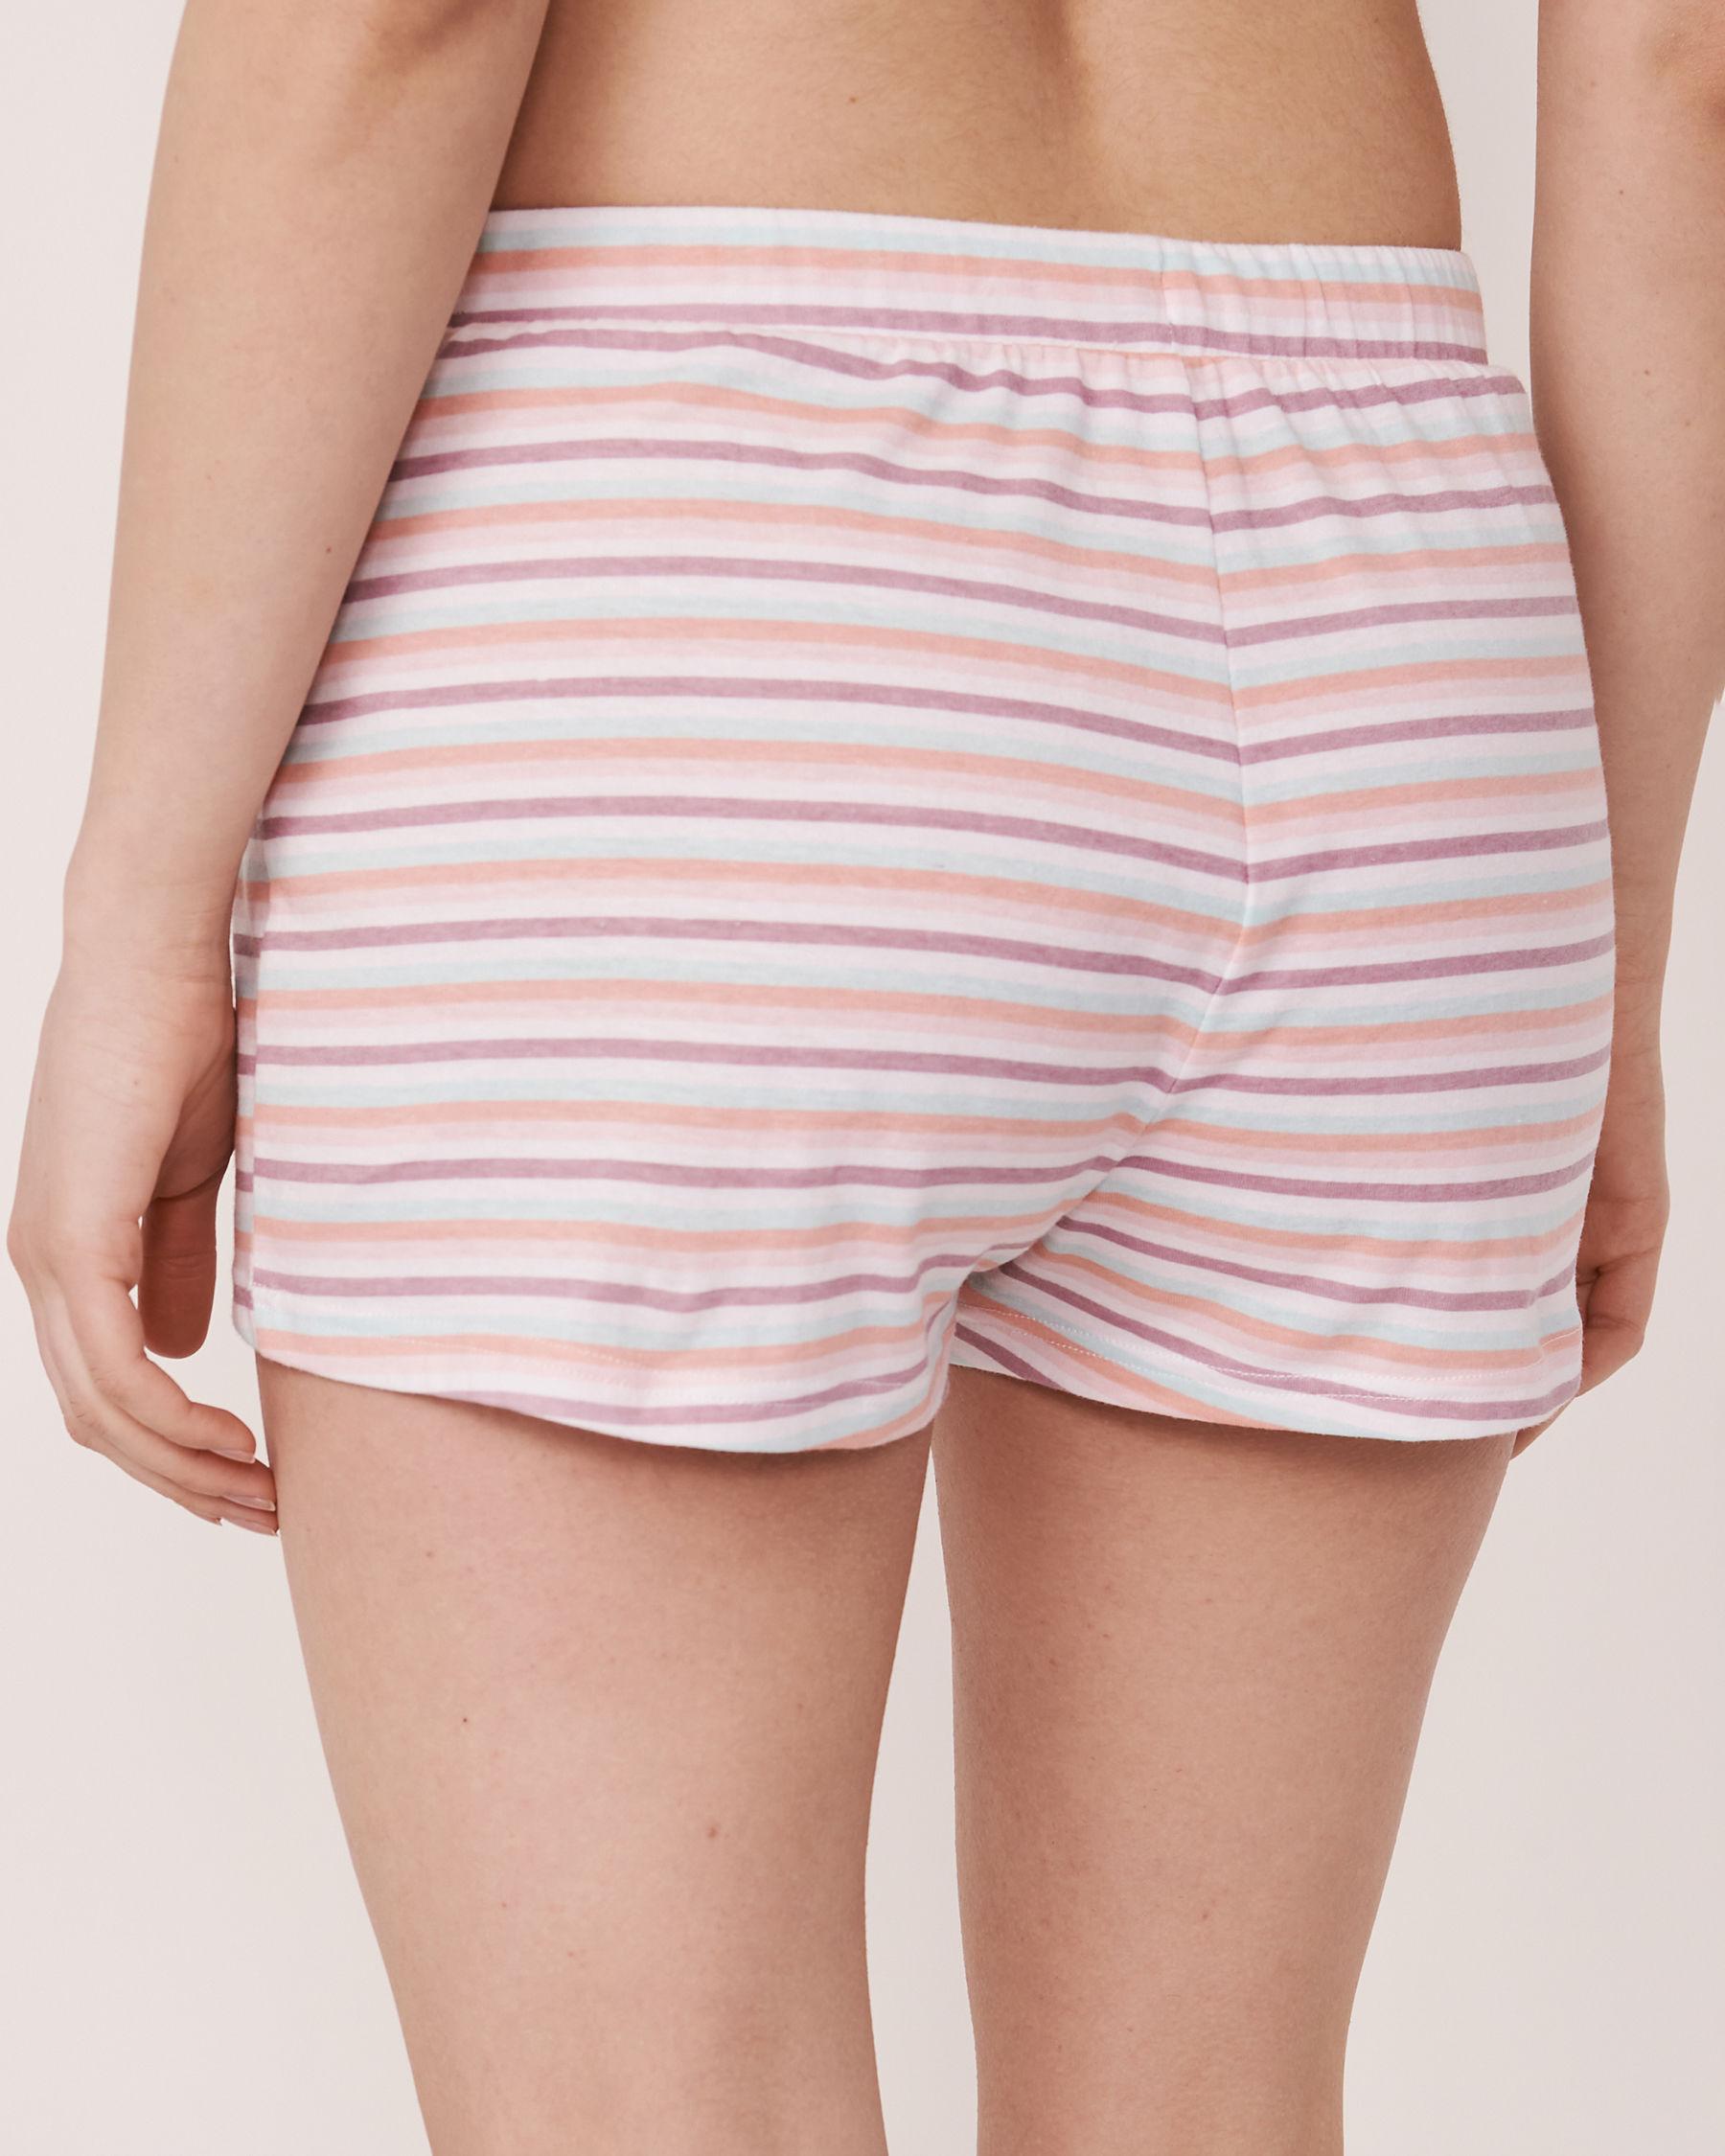 LA VIE EN ROSE Pyjama Short with Elastic Waistband Stripes 40200047 - View2